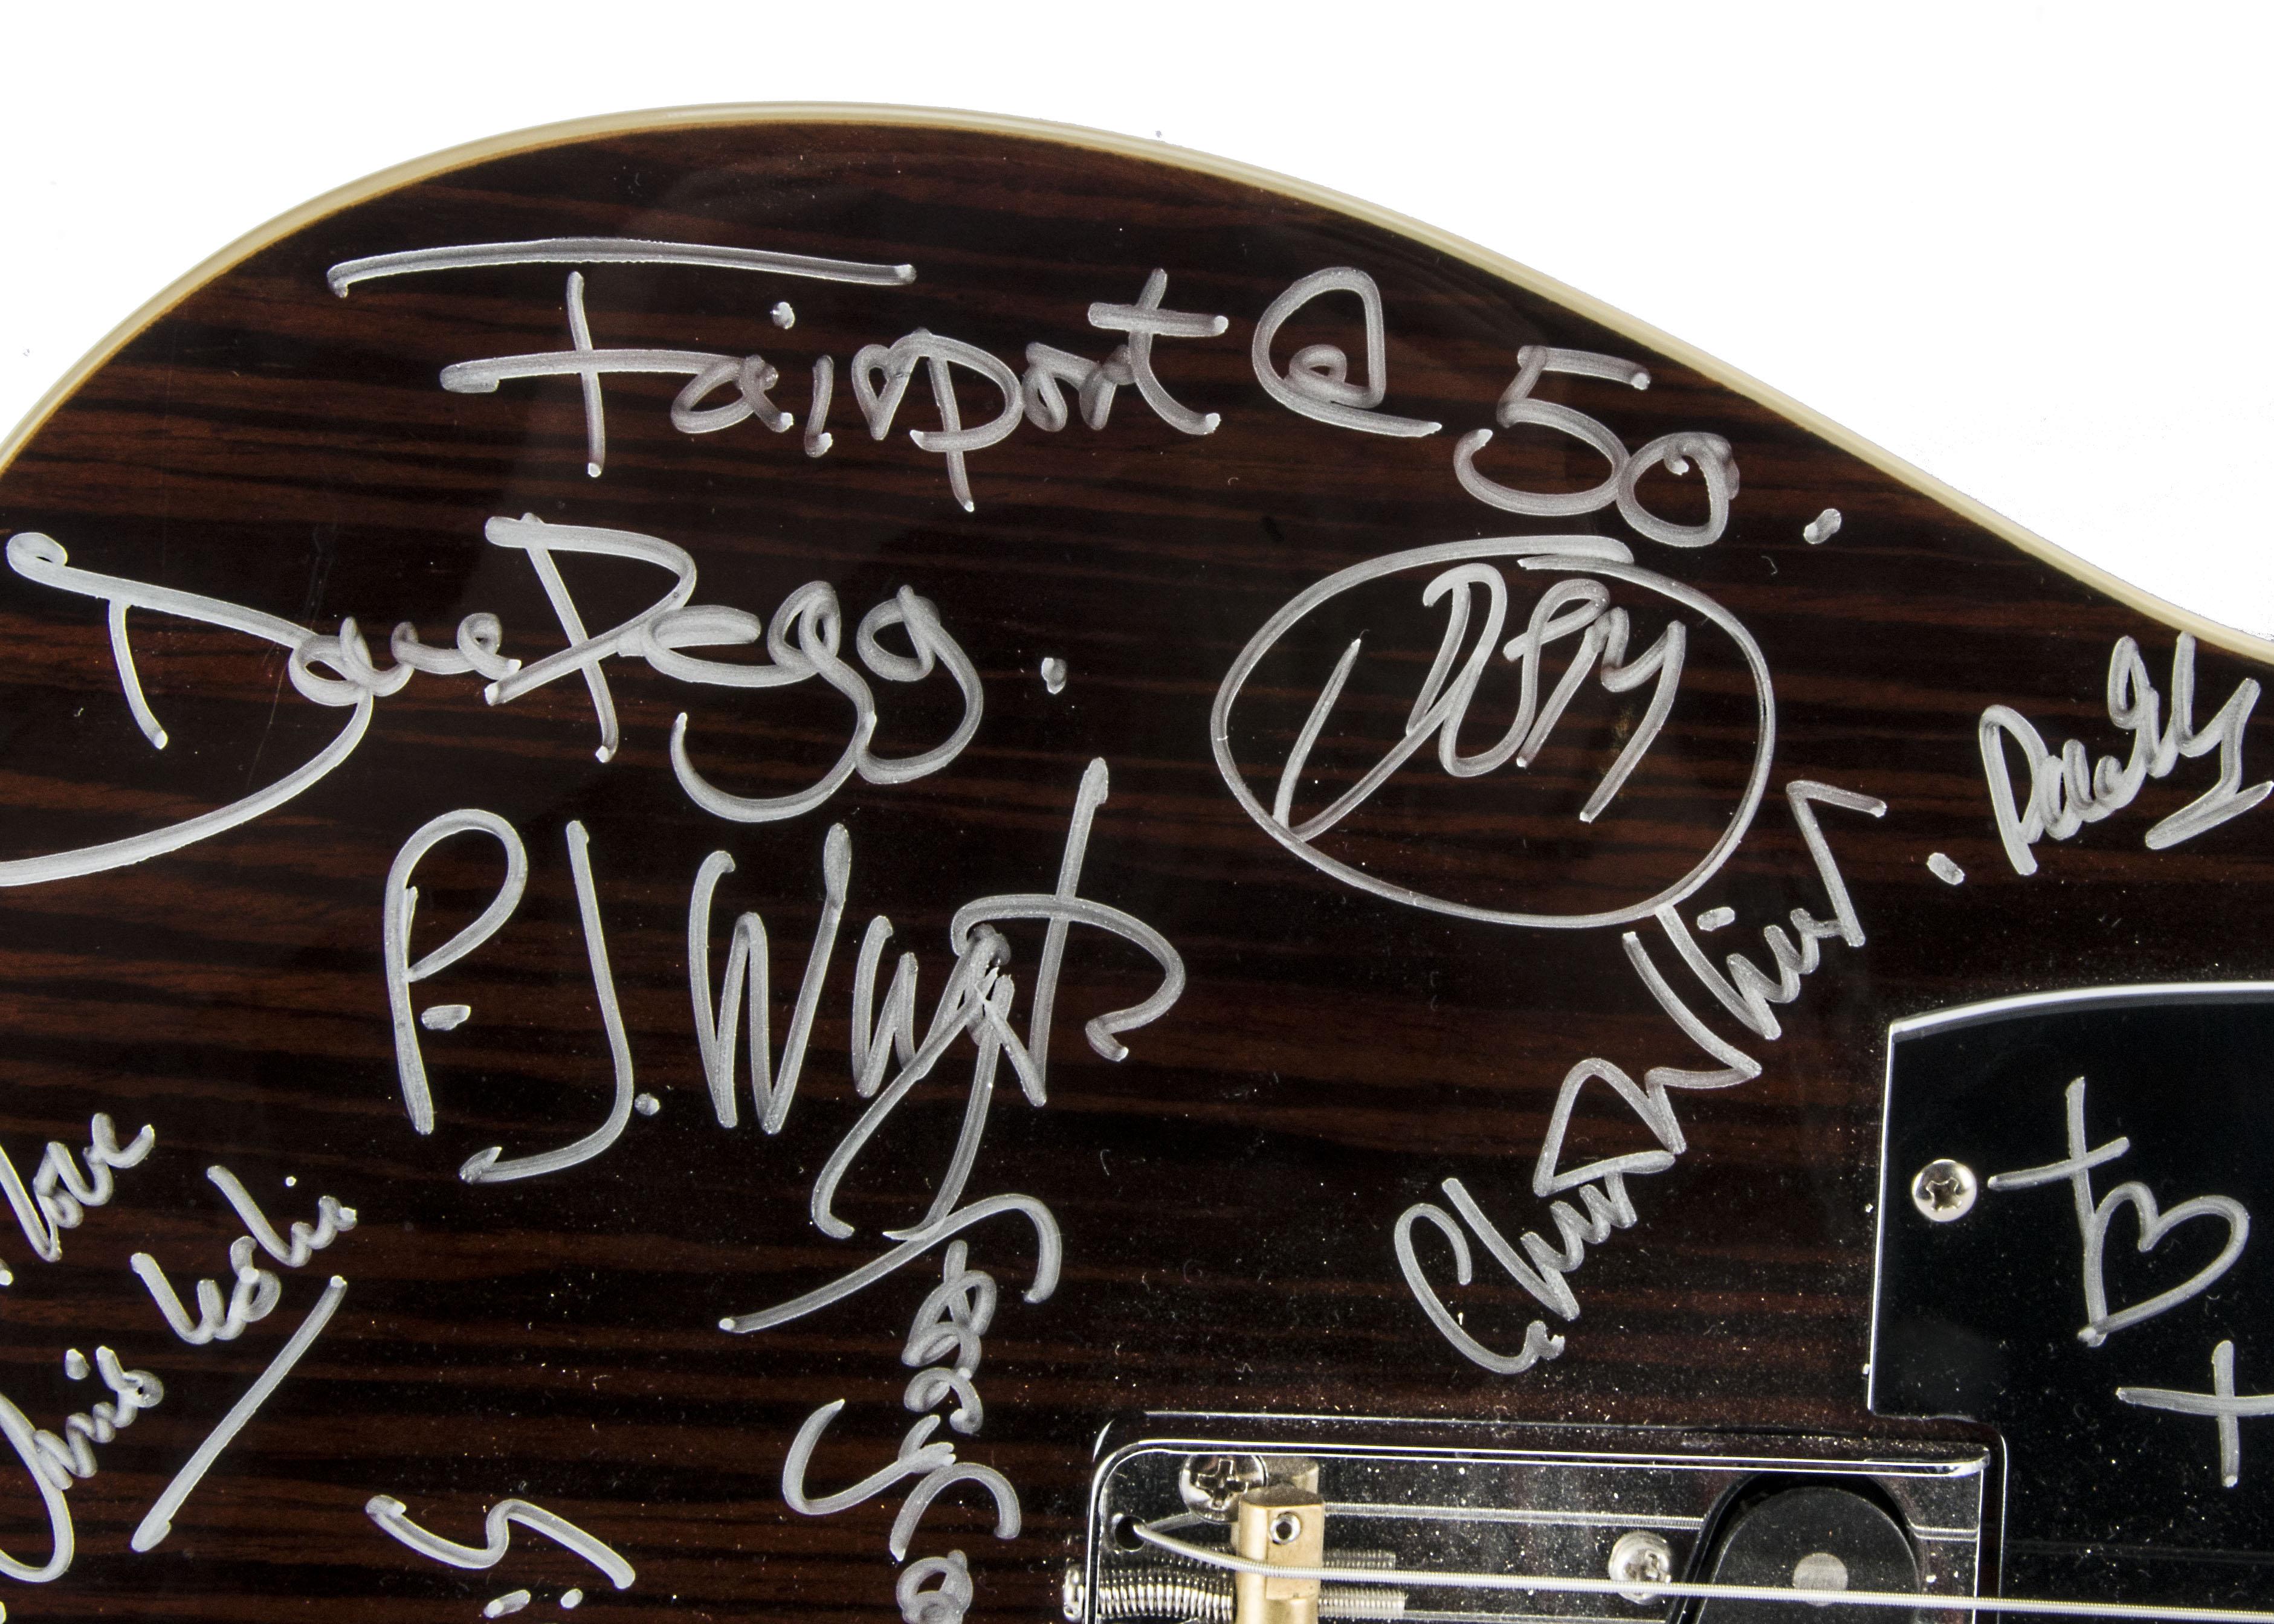 Lot 686 - Fairport Convention / Autographs, A Harvey Bentone Guitar signed by Judy Dyble, Richard Thompson,